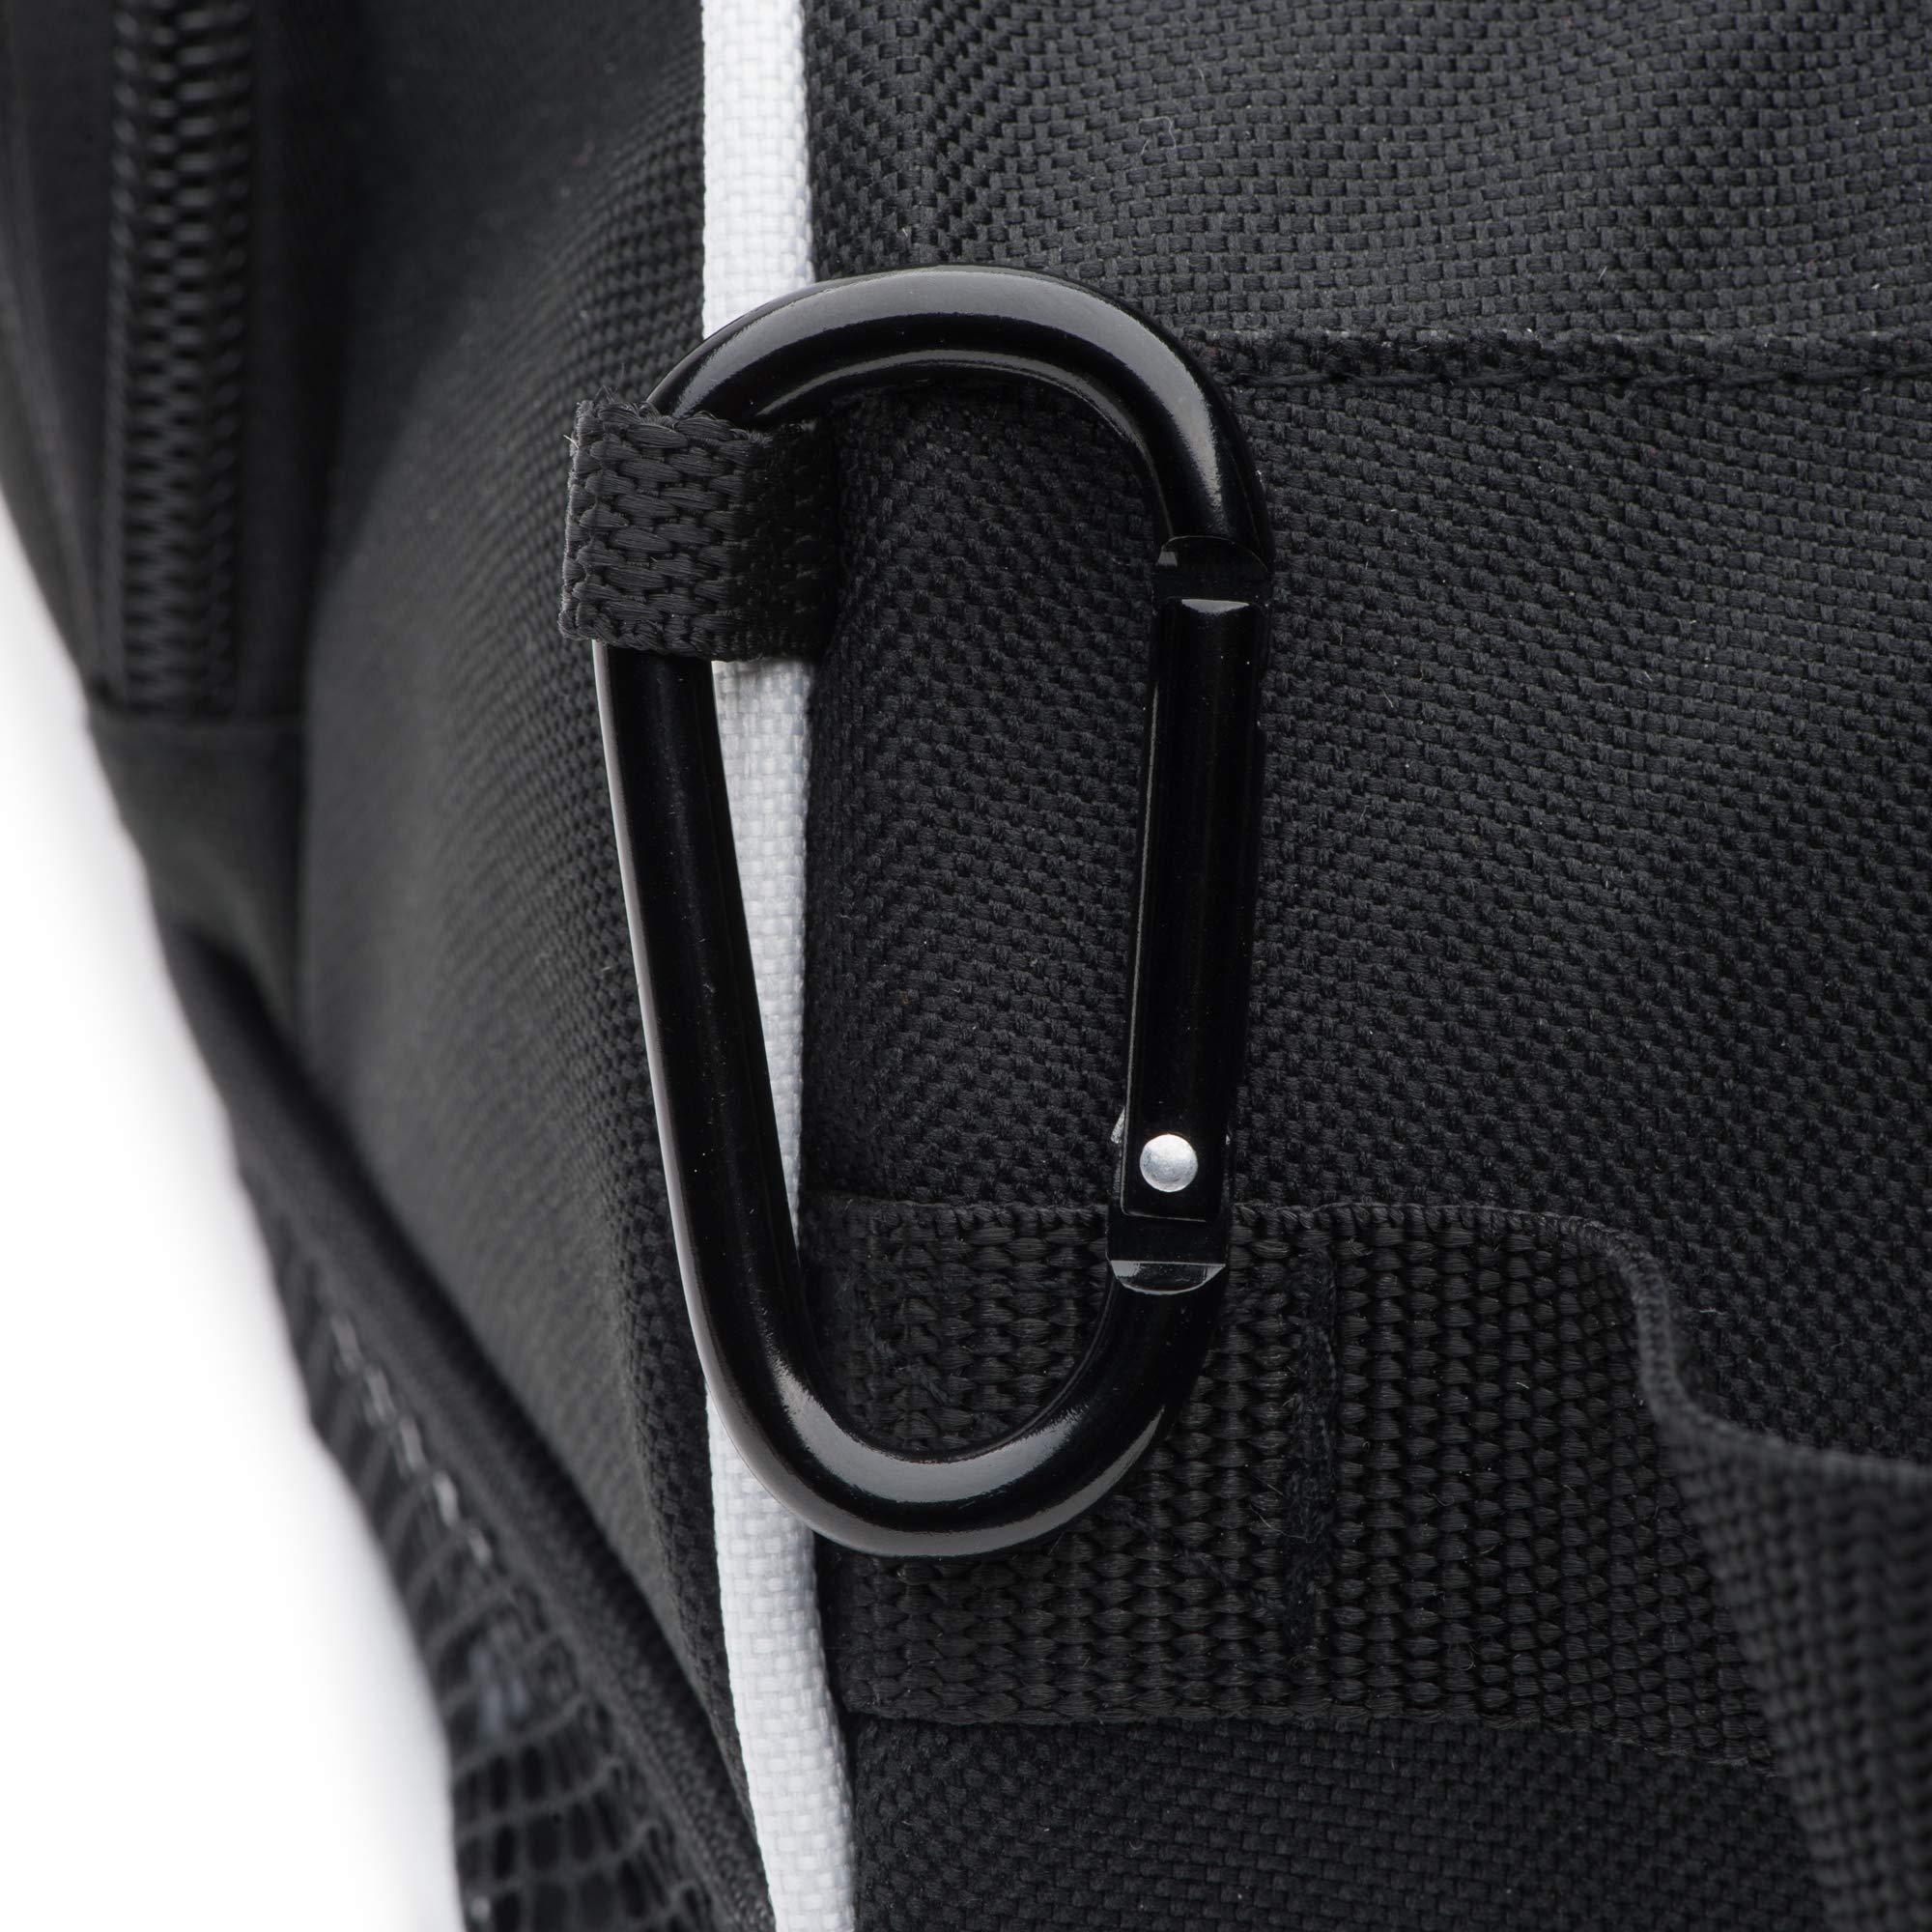 DesignWorks Golf Shoe Bag Tote for Men and Women, Hanging Clip and Large Zippered Side-Pockets, includes Golf Accessories Bonus by DesignWorks (Image #7)